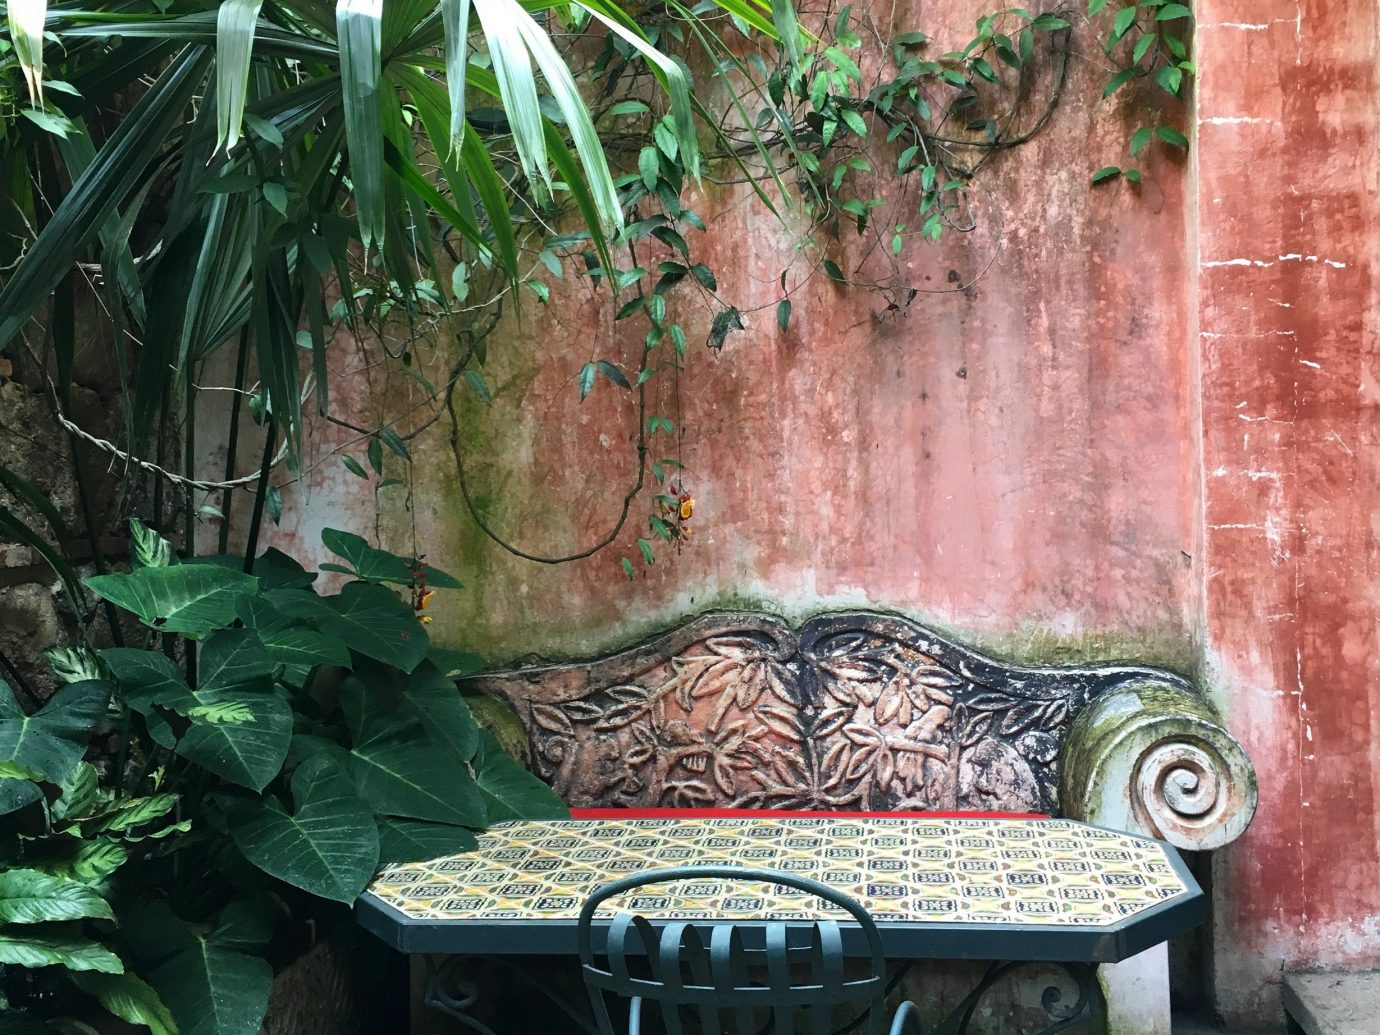 Hotels Luxury Travel Trip Ideas Garden water feature yard backyard flower fountain stone plant